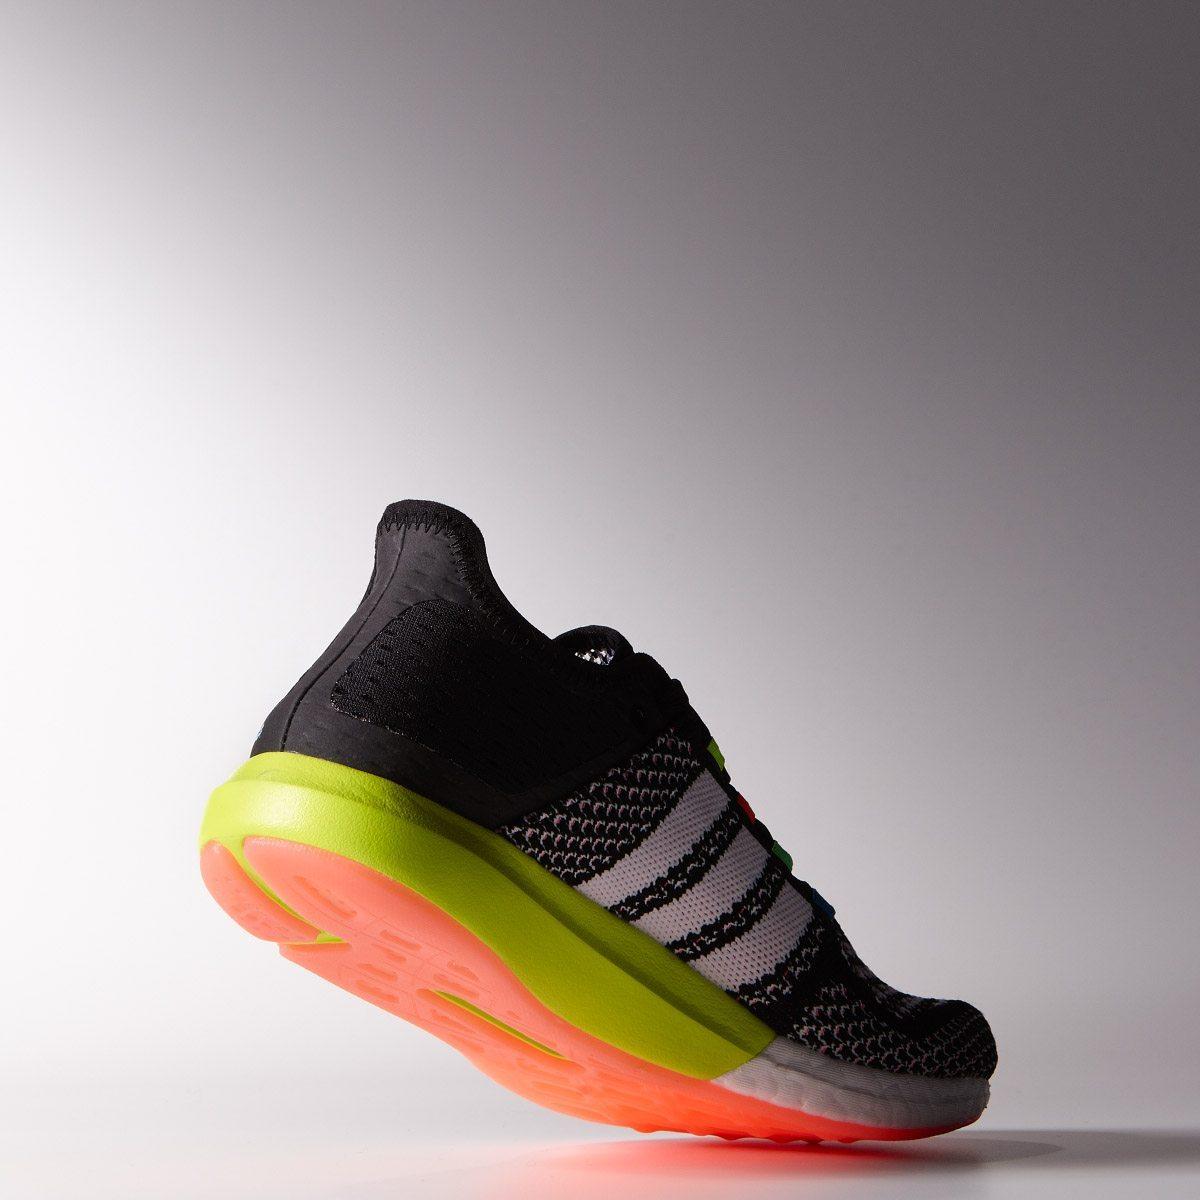 adidas Climachill Cosmic Gazelle Boost 12